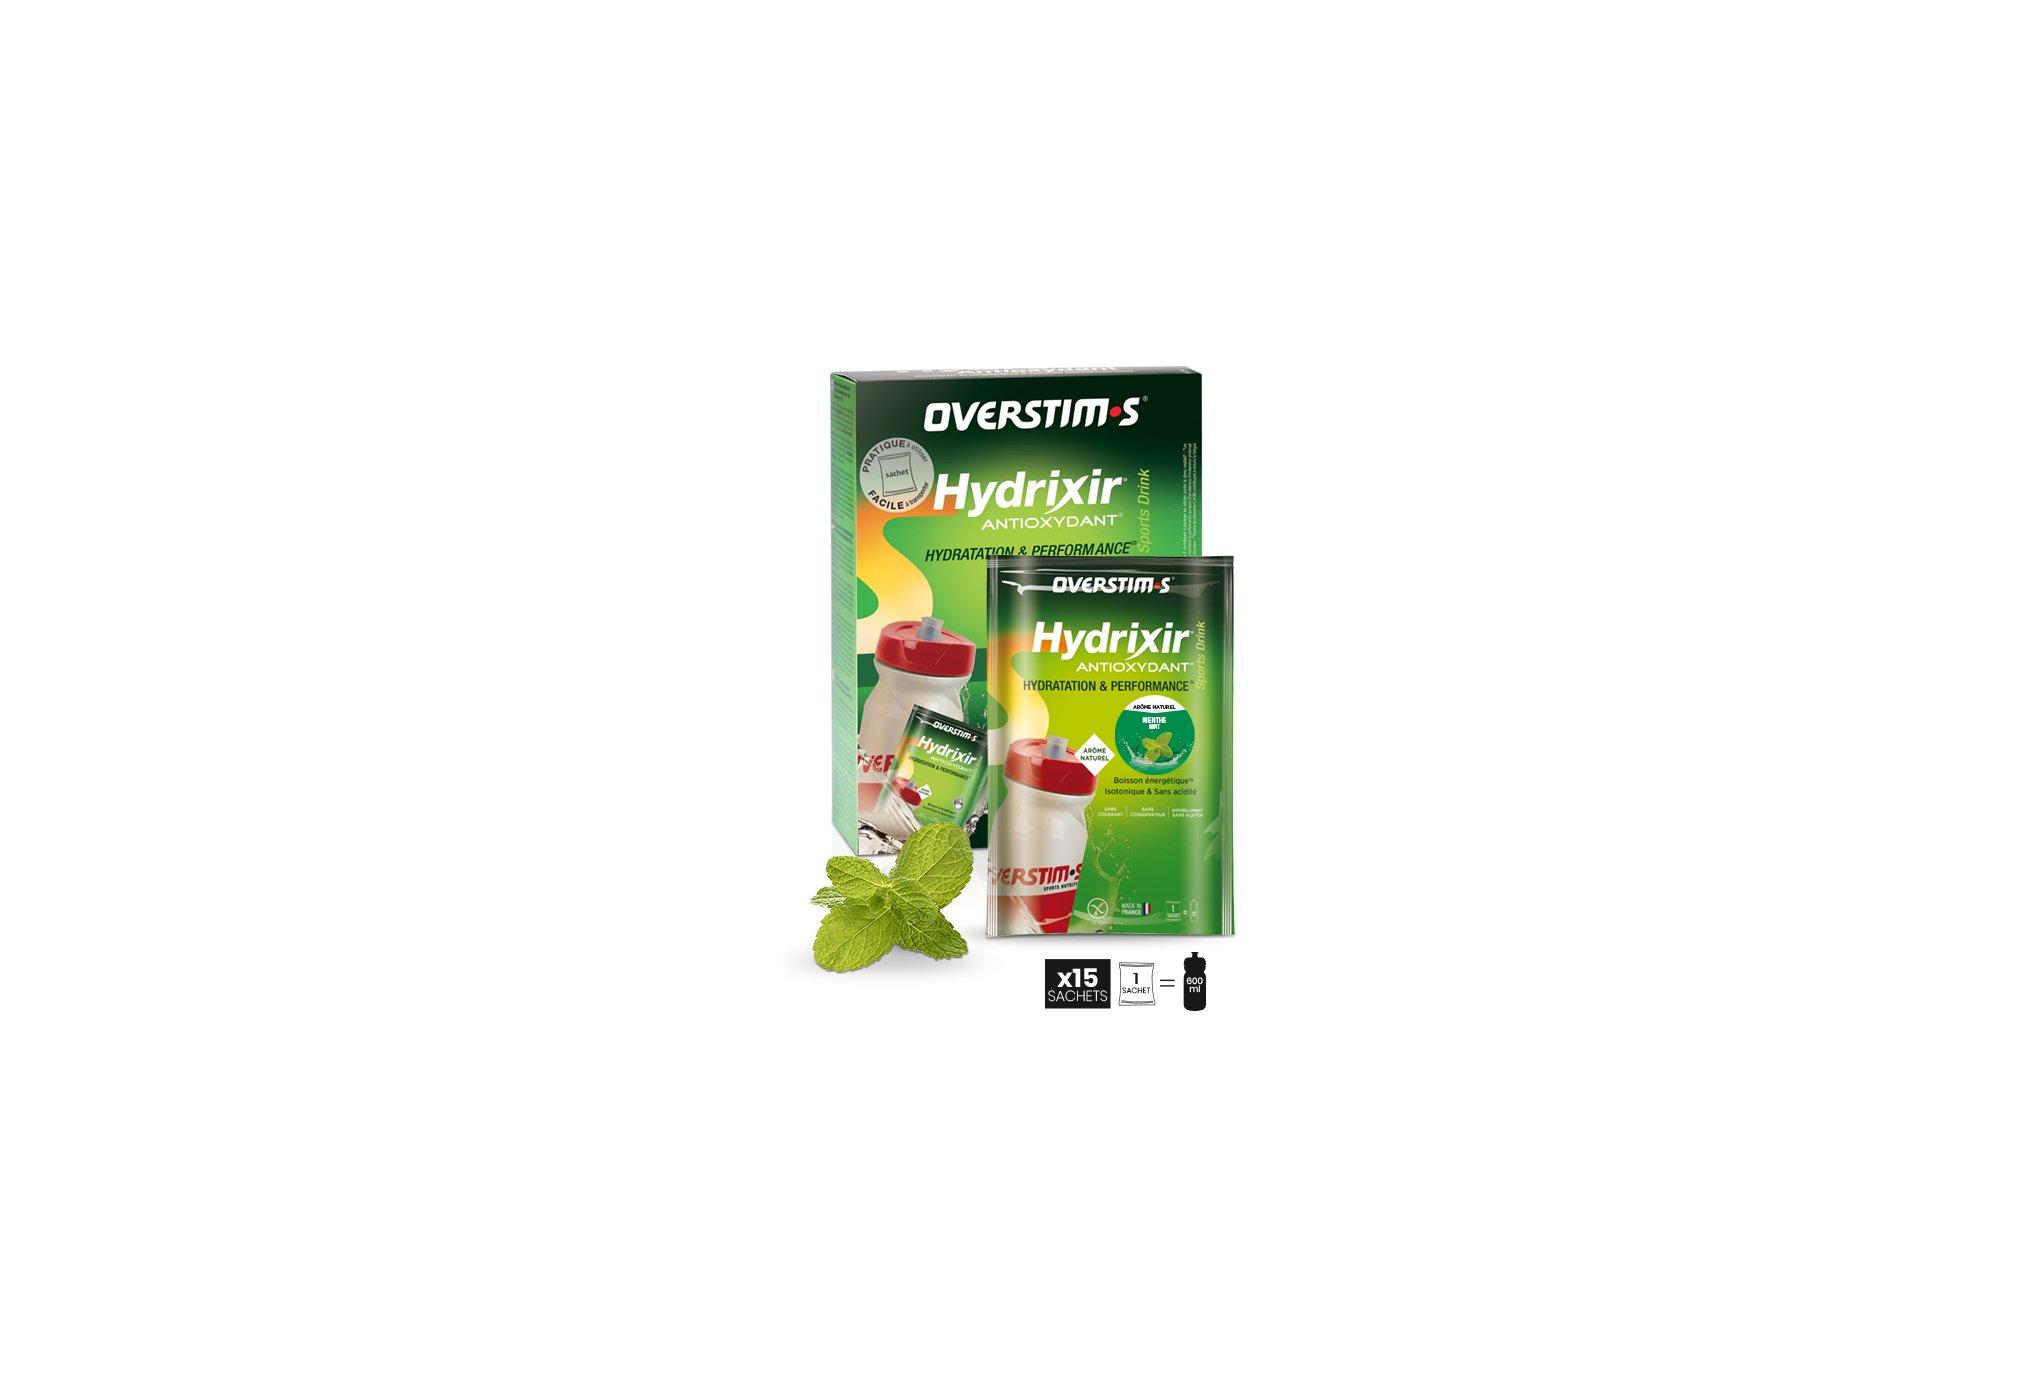 OVERSTIMS Hydrixir 15 sachets - Menthe Diététique Boissons